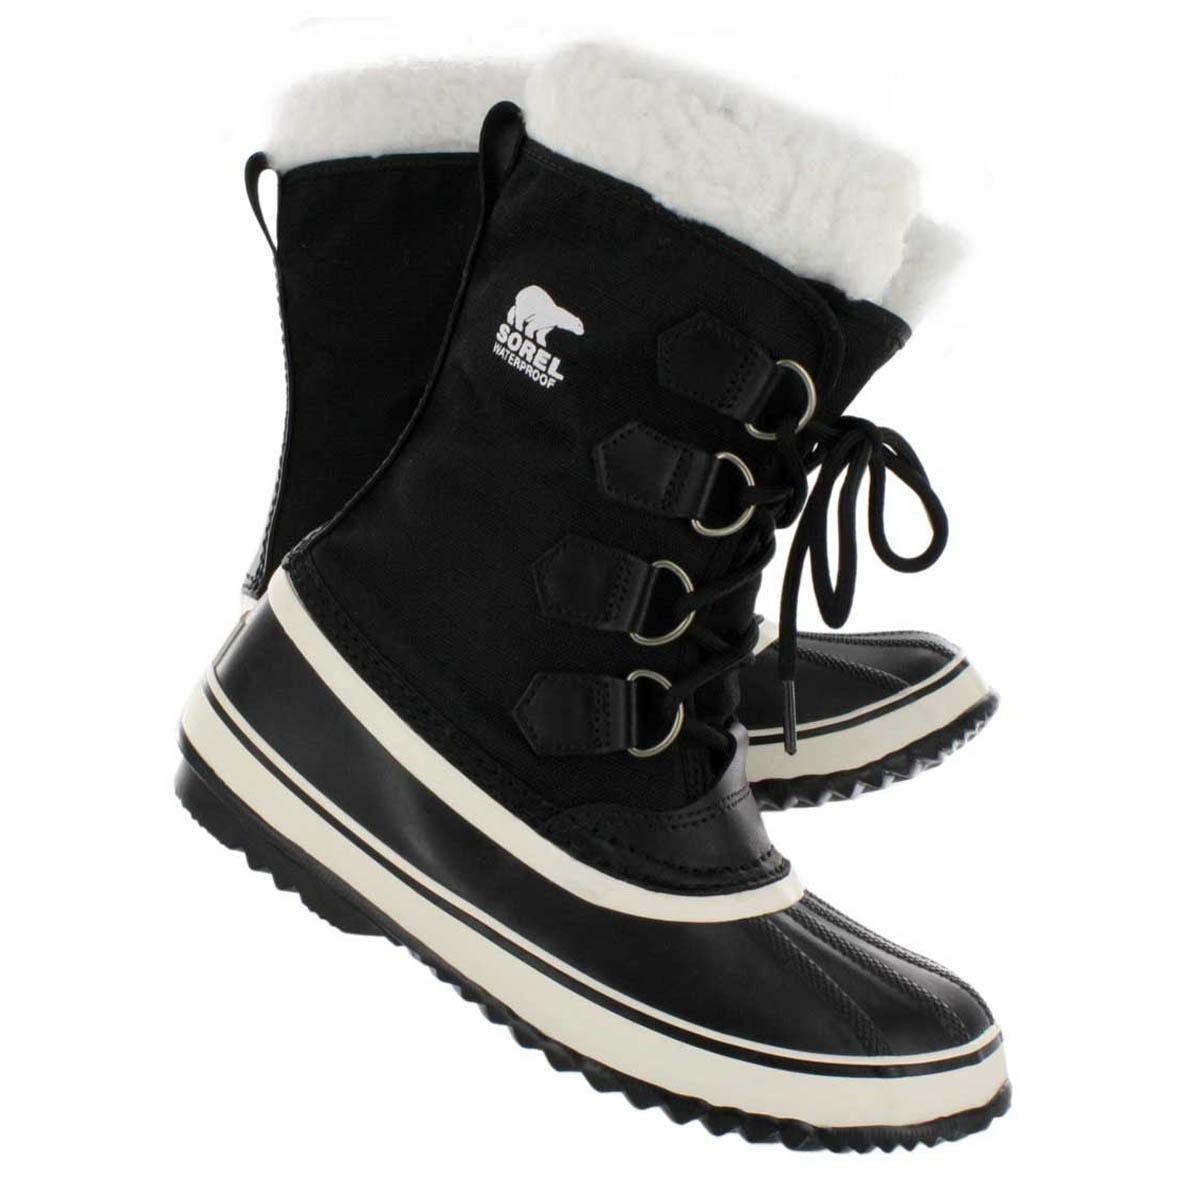 sorel winter carnival boots s black